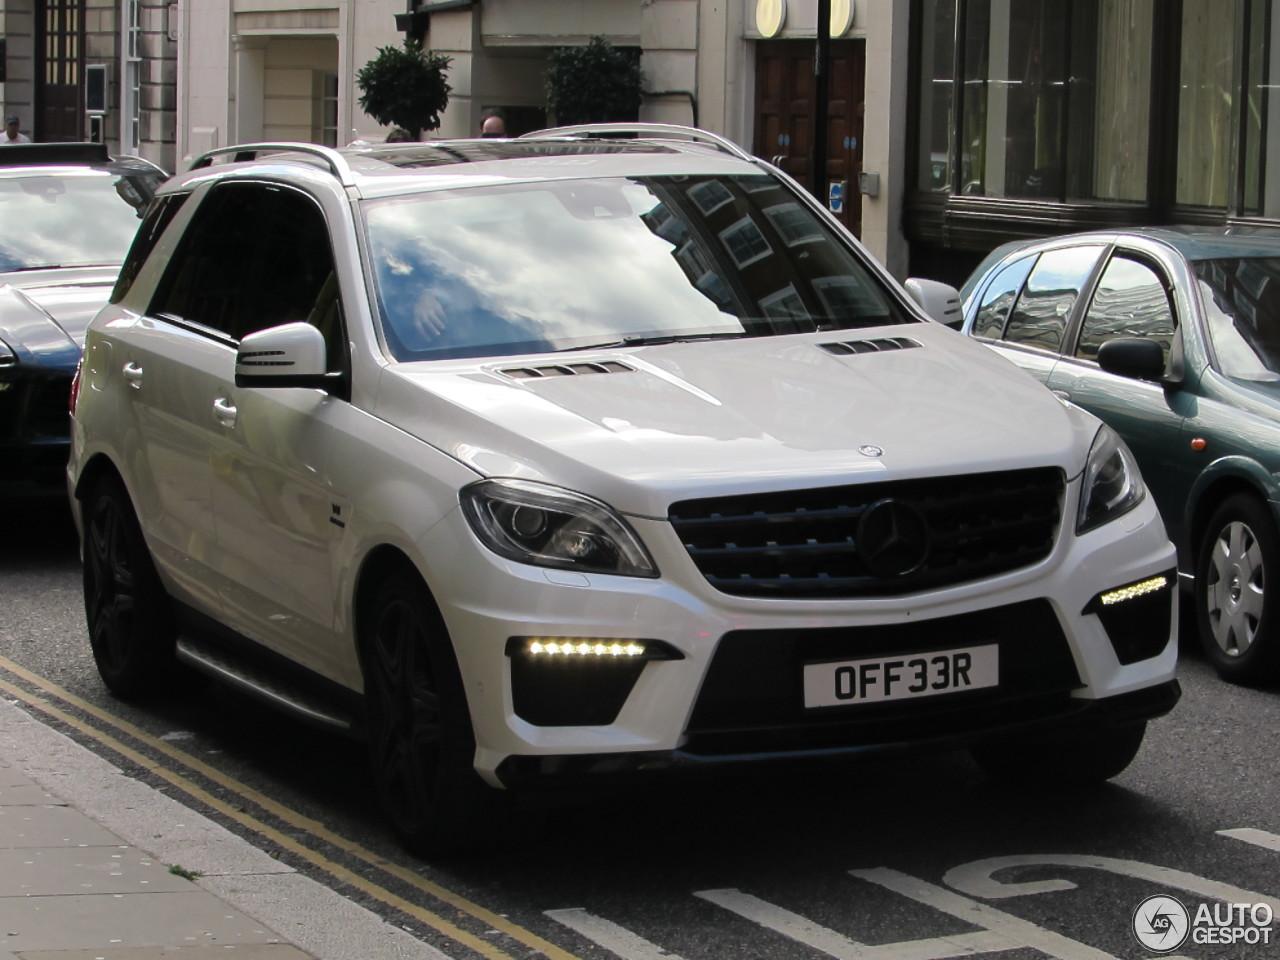 Mercedes benz ml 63 amg w166 8 stycze 2017 autogespot for Mercedes benz ml 2017